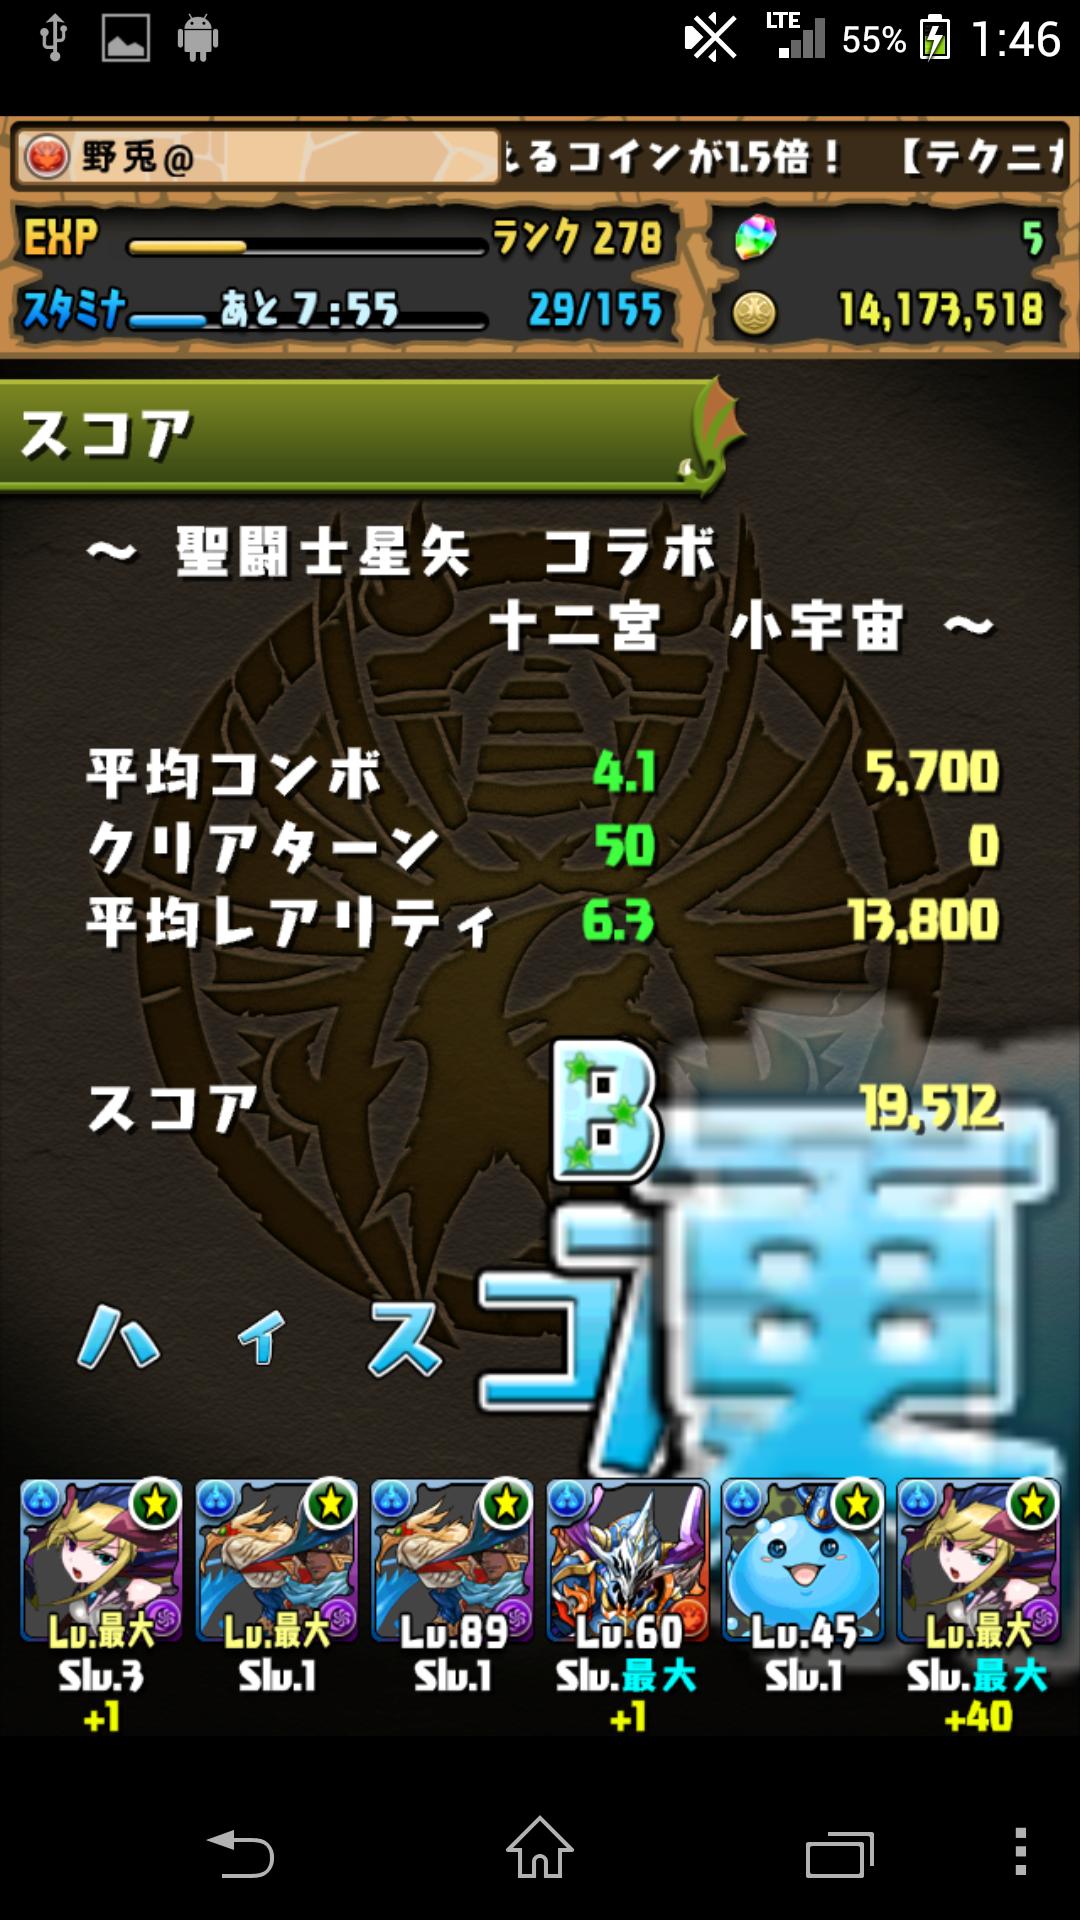 Screenshot_2014-06-23-01-46-42.png